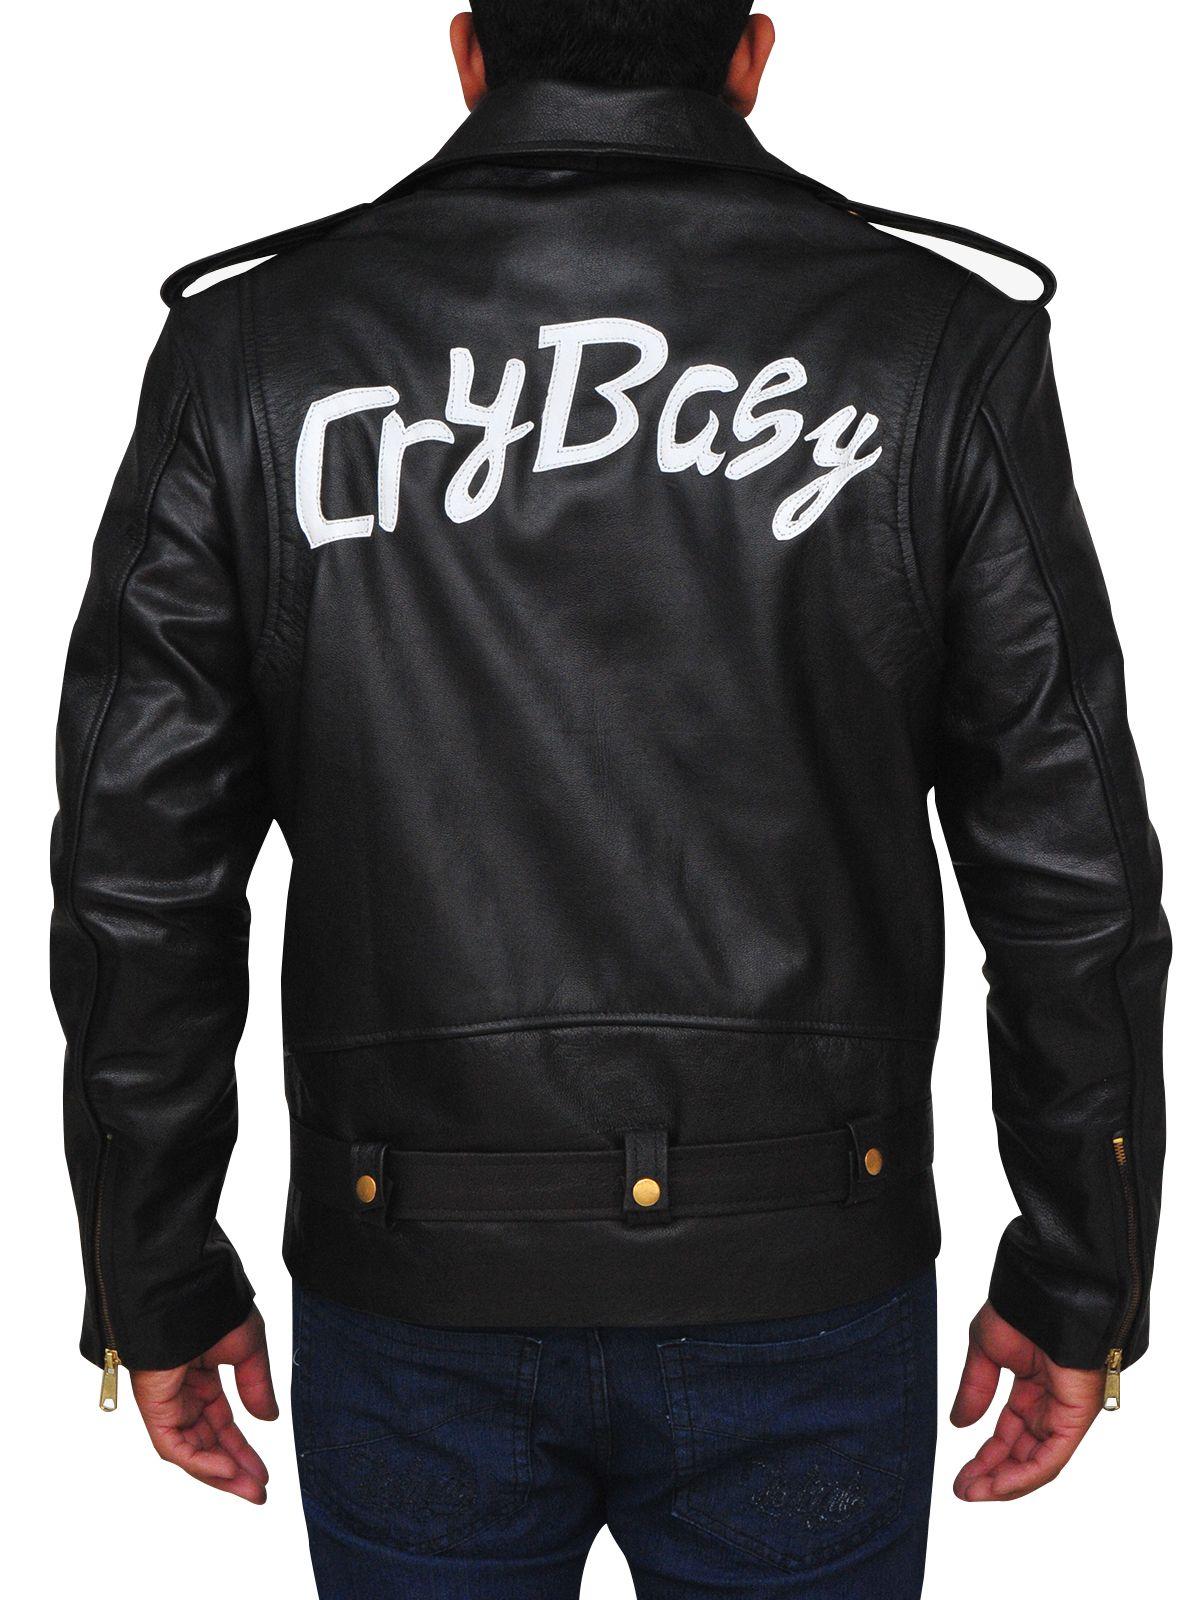 Black Brando Leather Jacket Baby Leather Jacket Leather Jacket Classic Leather Jacket